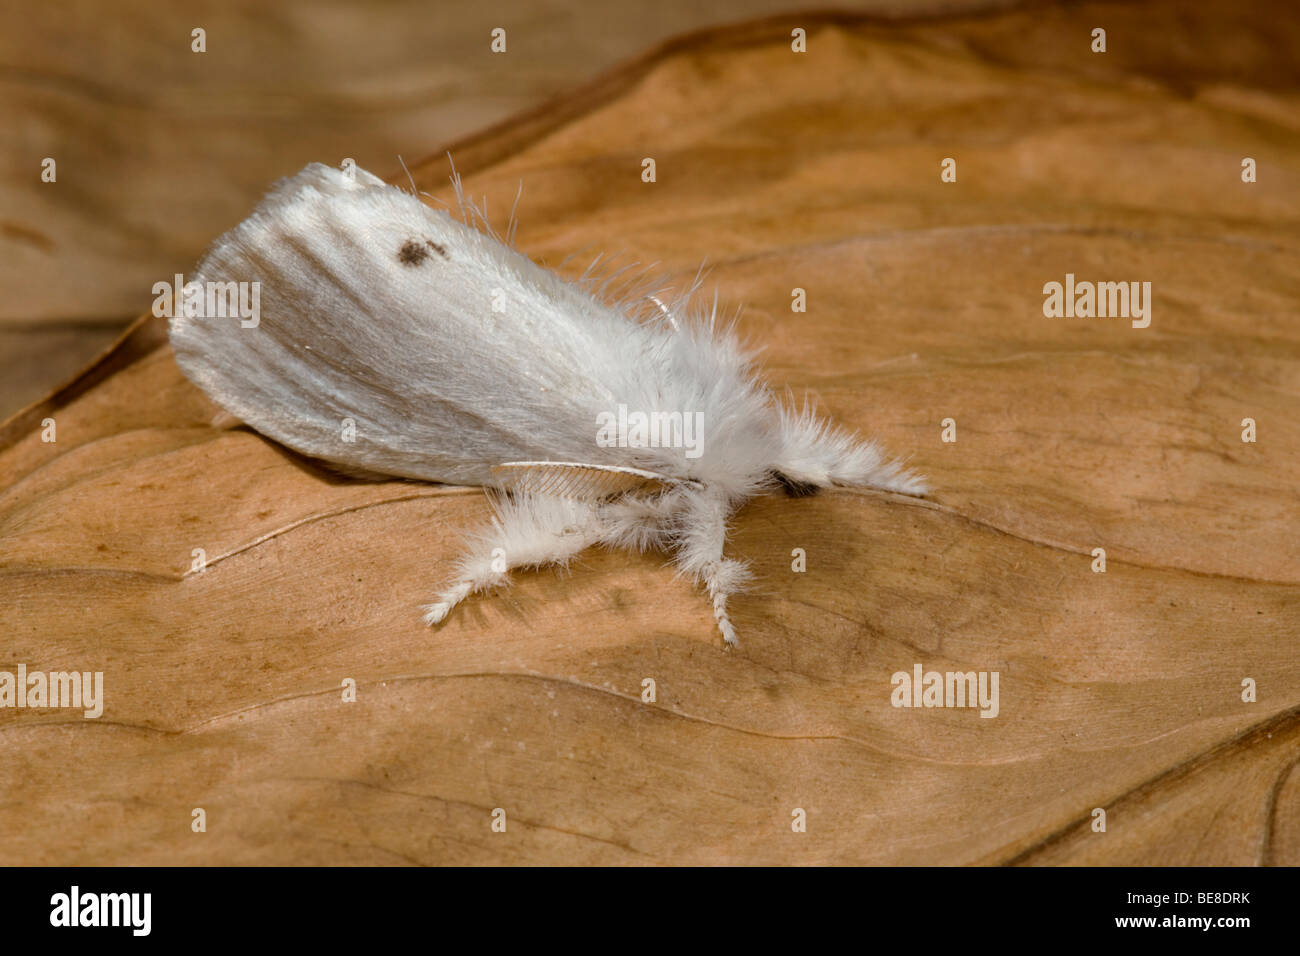 gelb-Tail Motte; Euproctis Similis; Männlich Stockbild